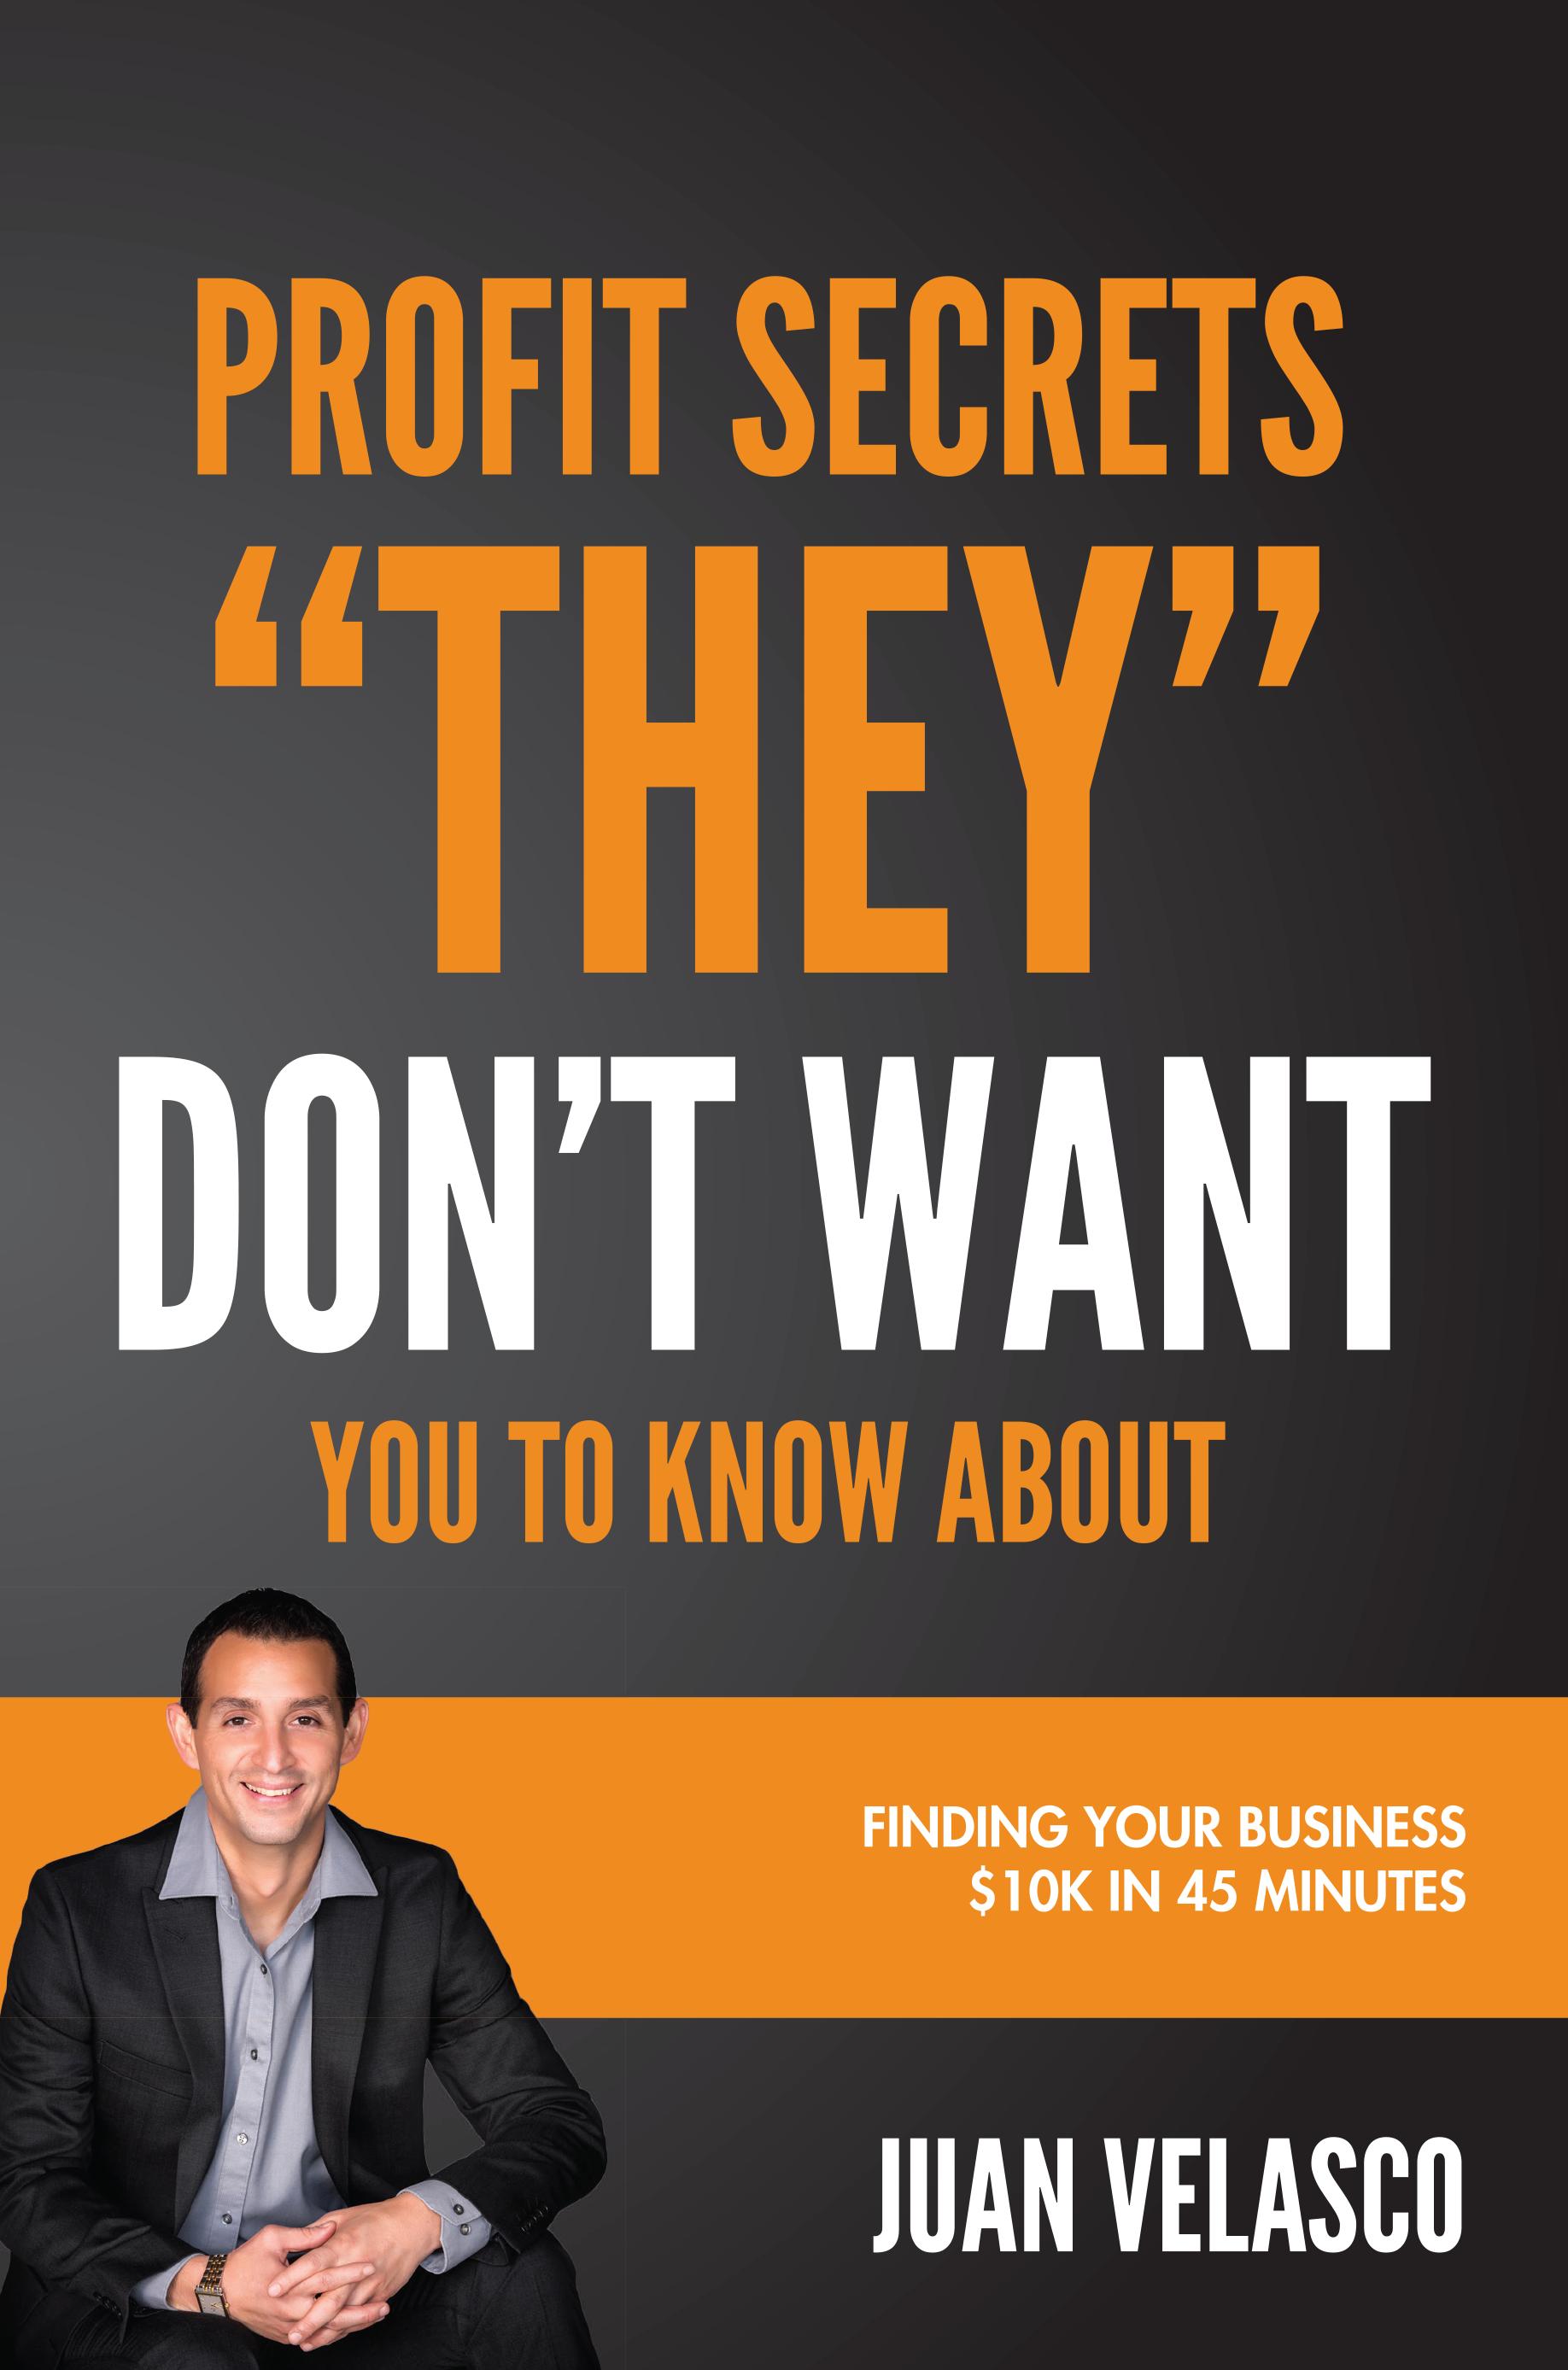 Juan Velasco offers sure-fire tips for skyrocketing revenue in his new book